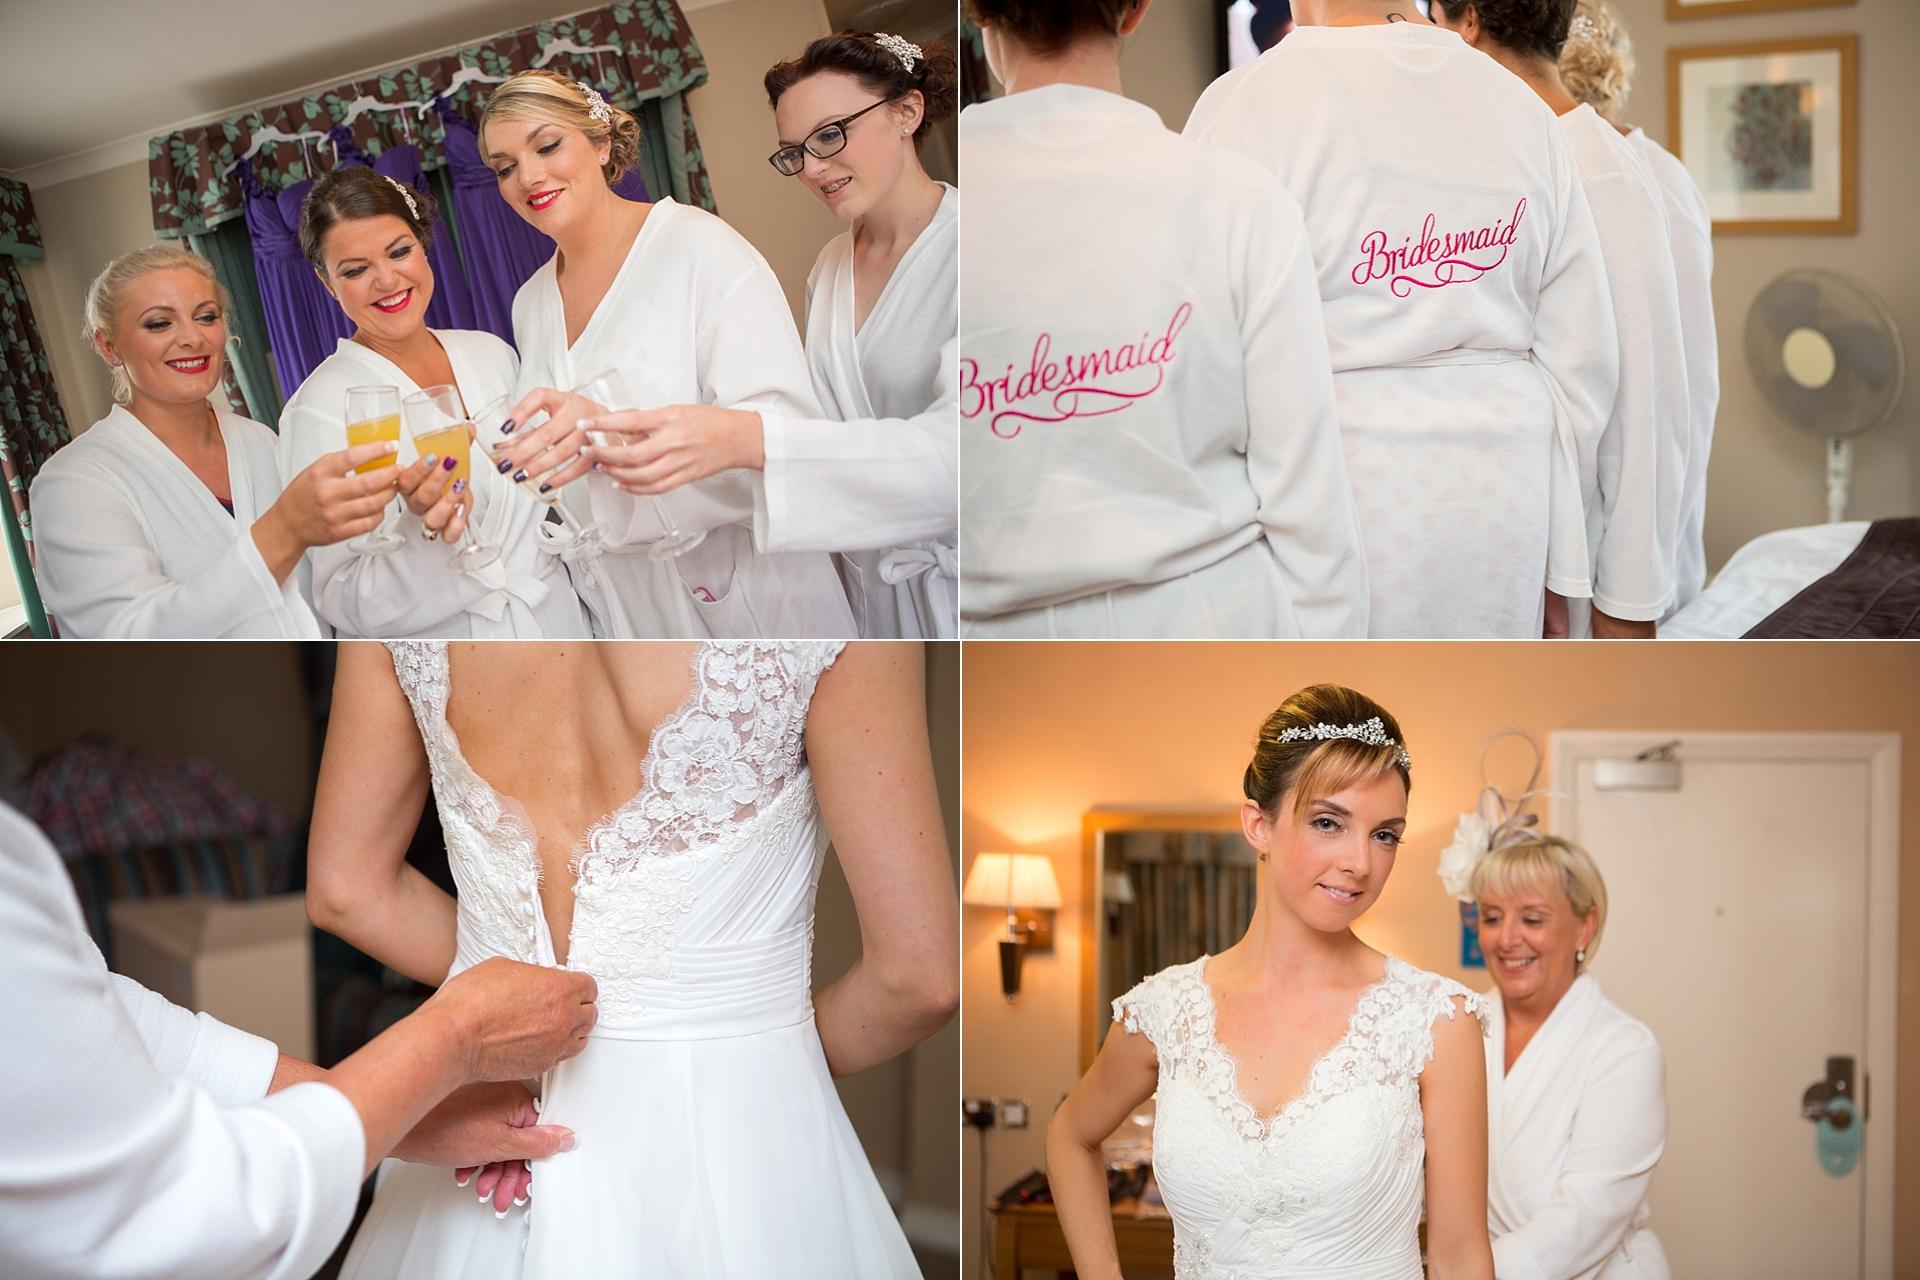 wedding+photographer+stoke+on+trent+chimney+house+sandbach+cheshire+6-2.jpg